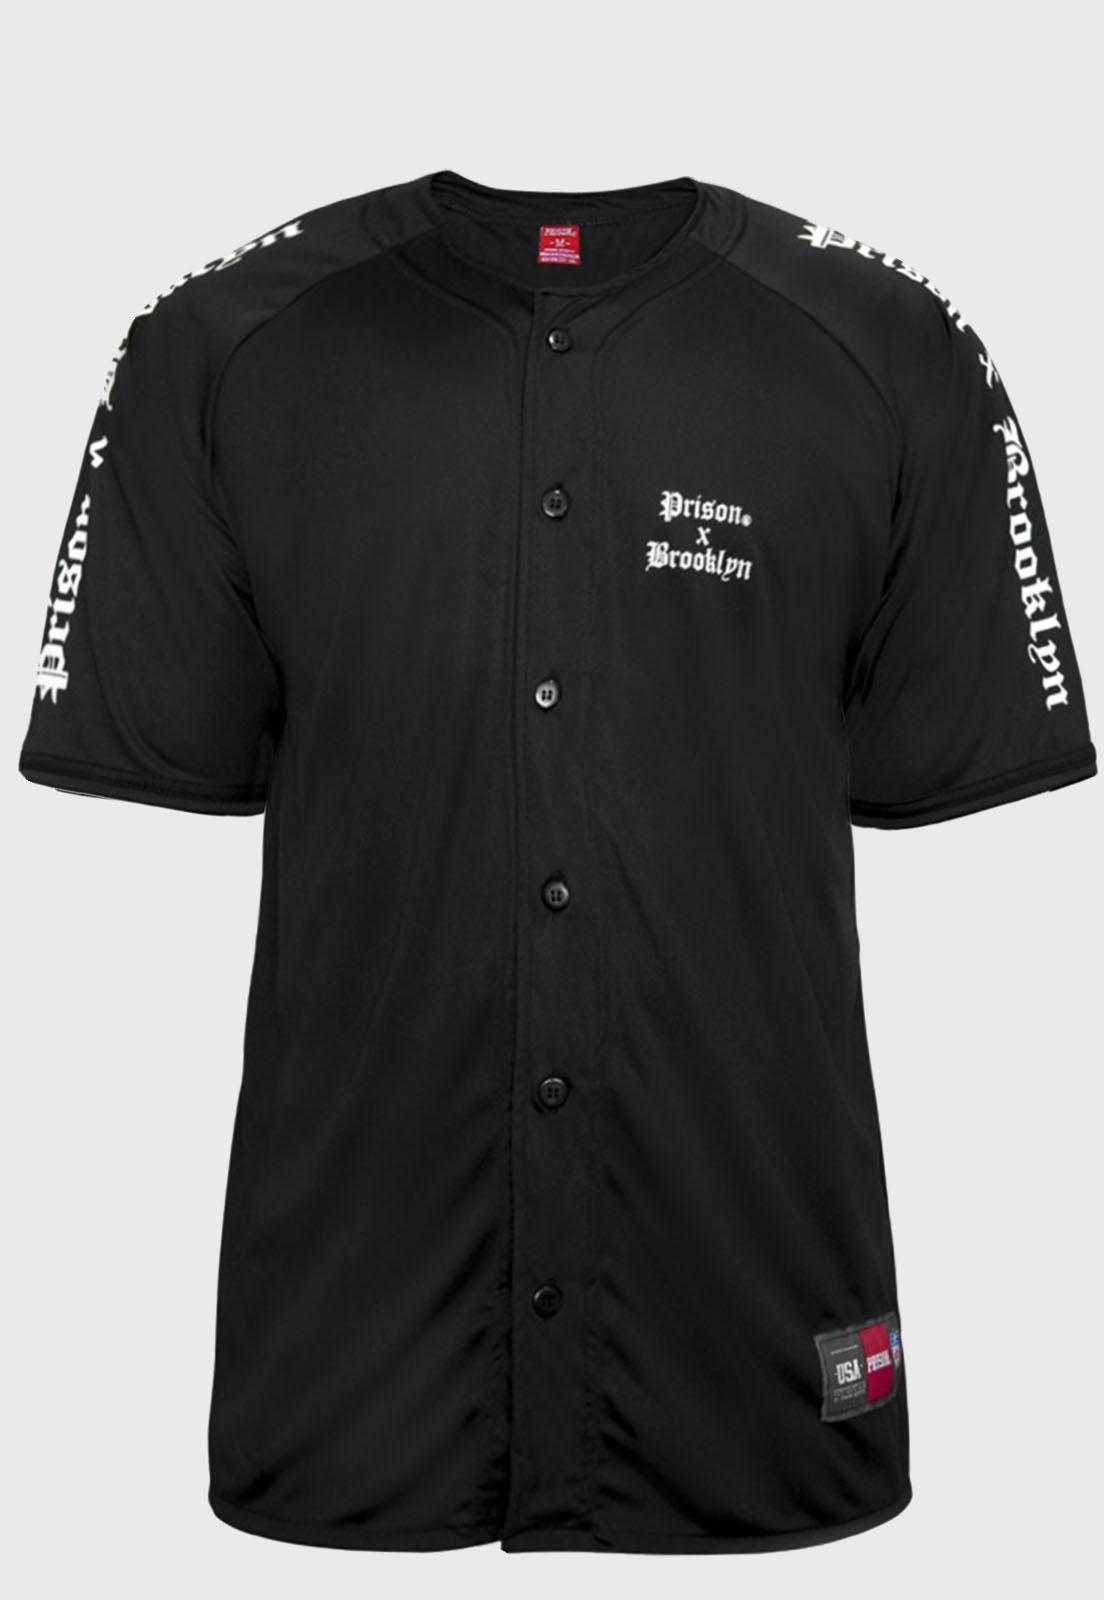 Camisa de Baseball Prison x Brooklyn